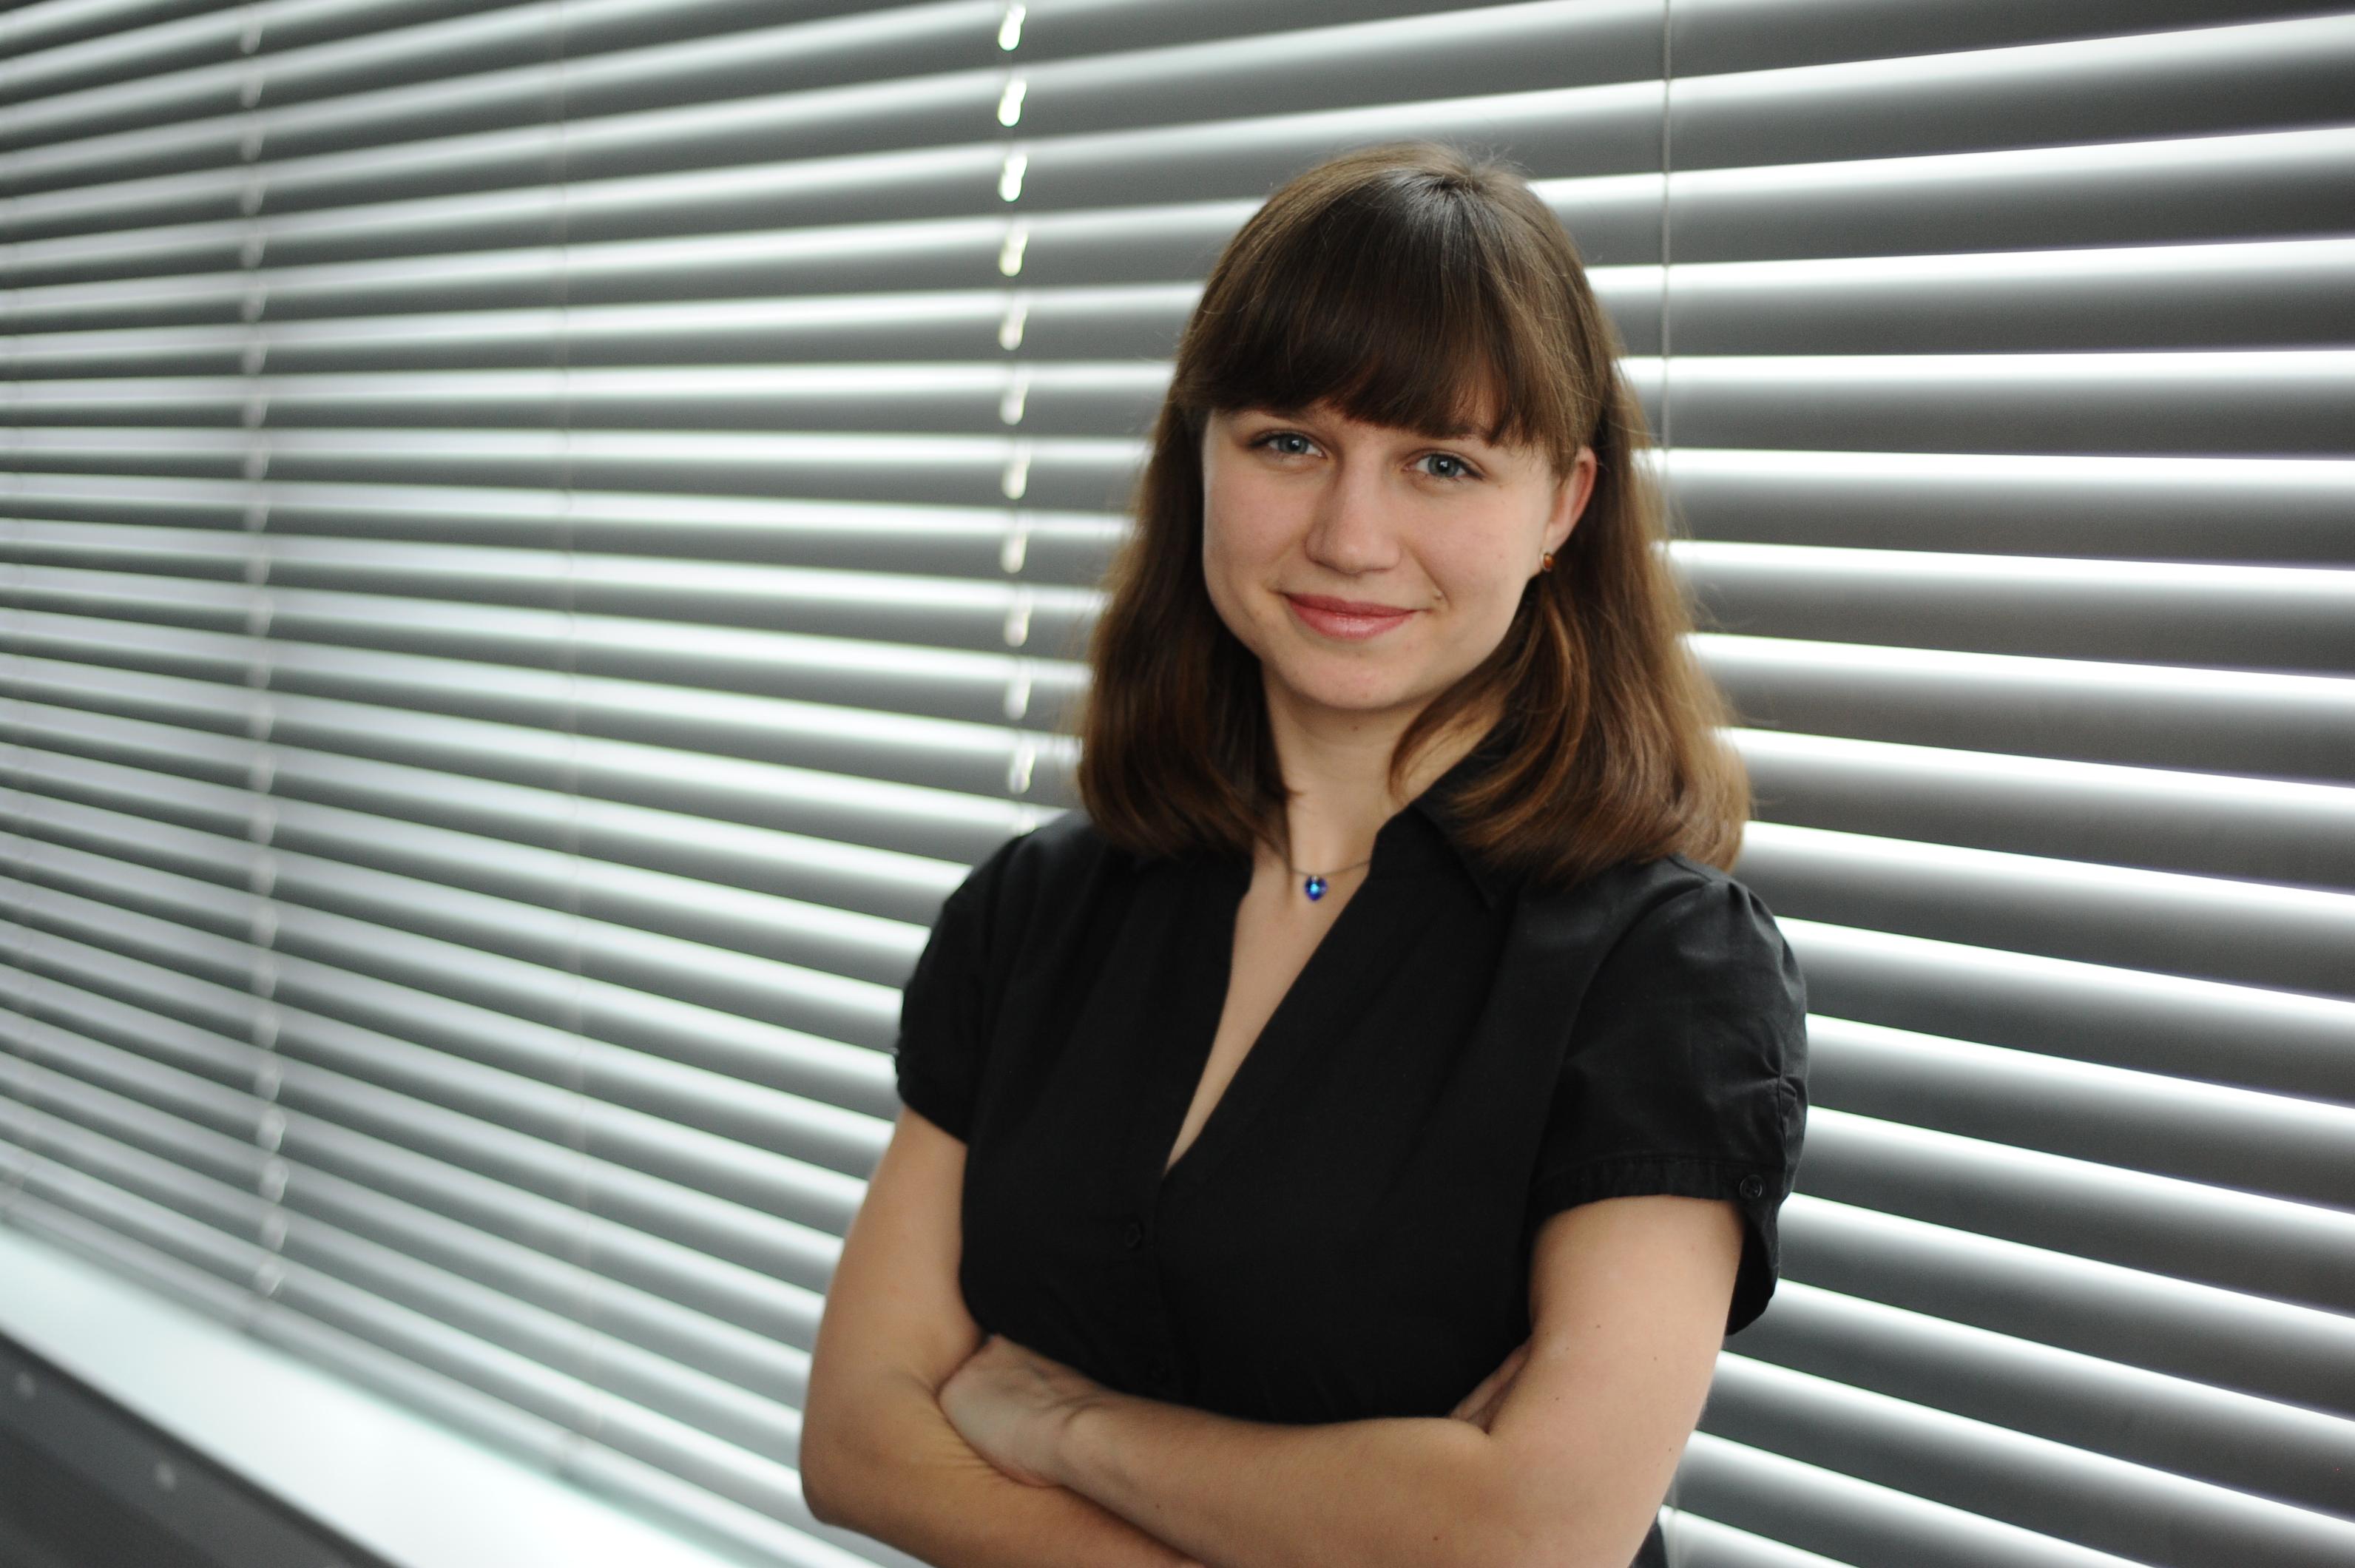 Teresa Kurek